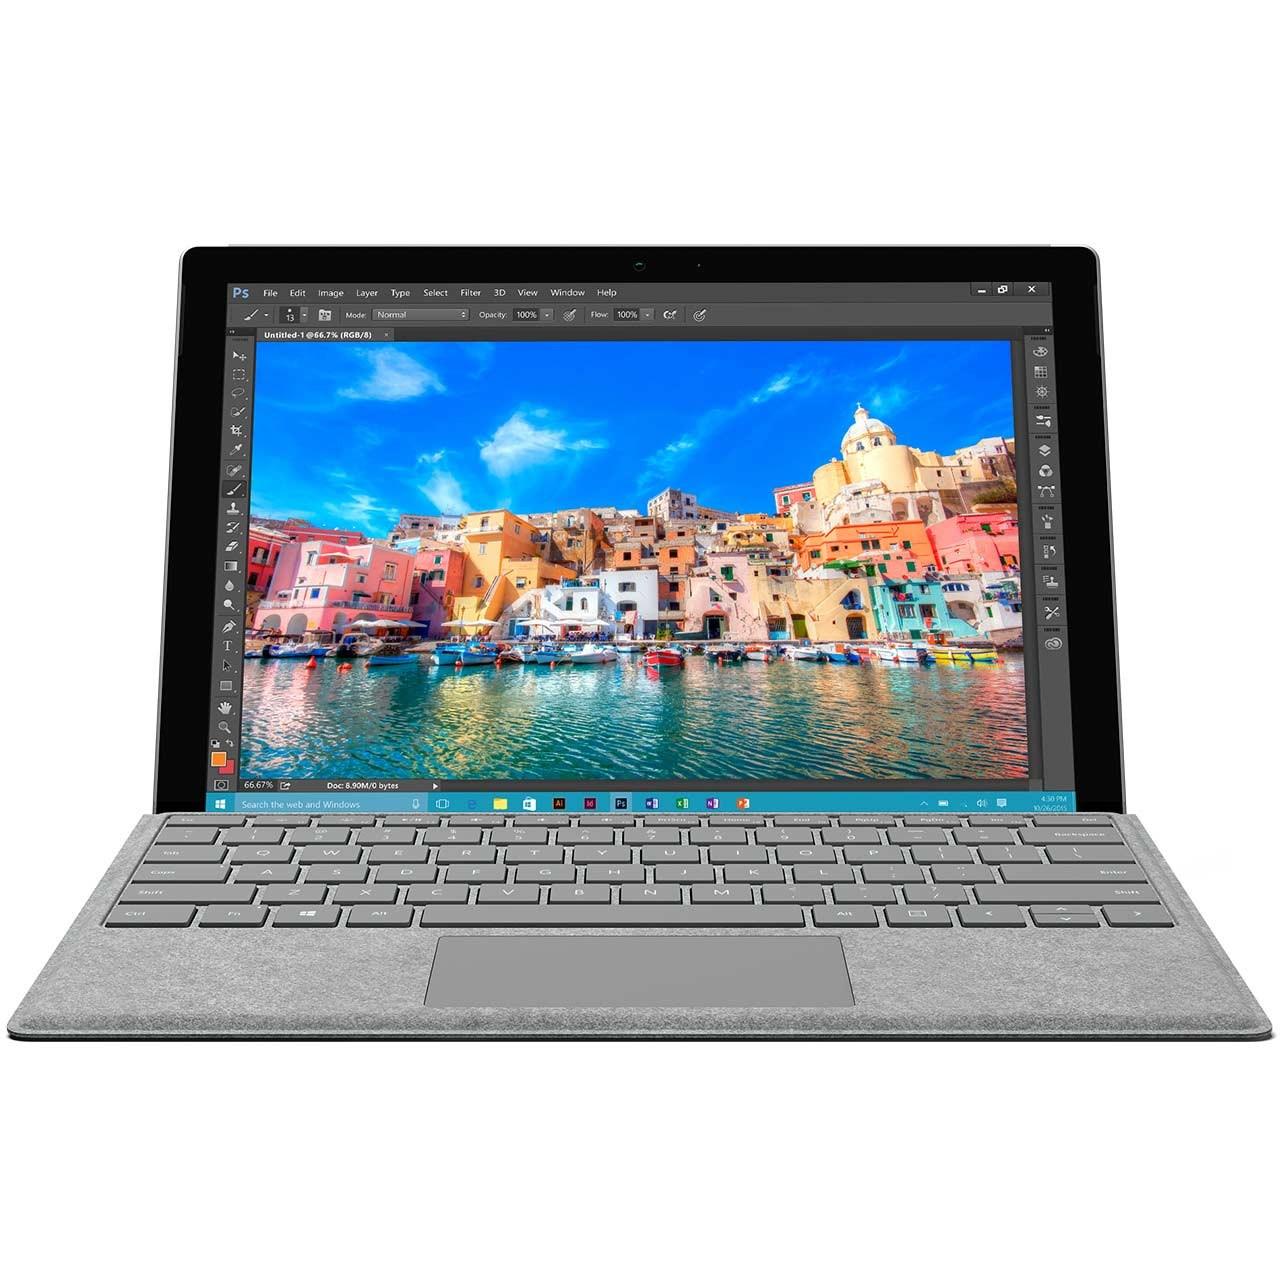 تبلت مایکروسافت مدل Surface Pro 4 - E به همراه کیبورد Signature Type Cover